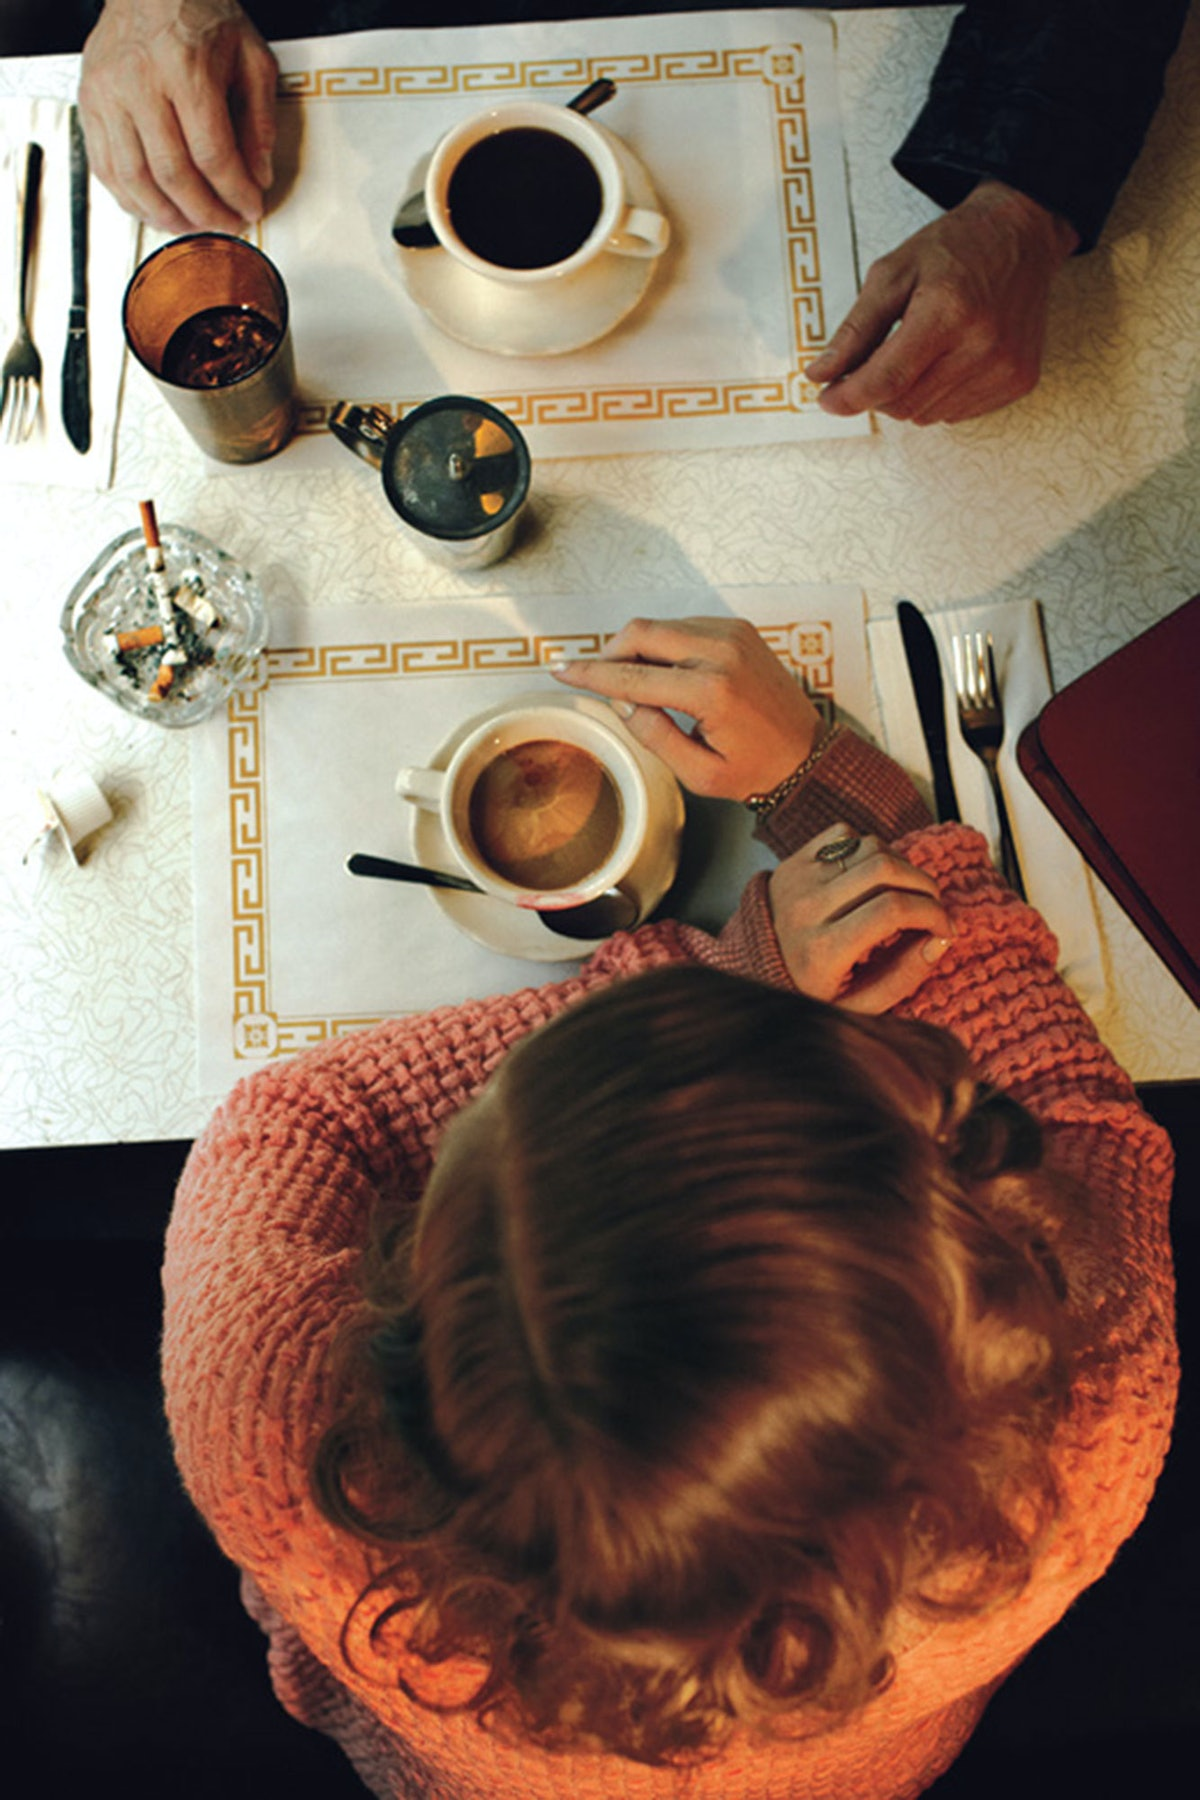 Lizzie Olsen by Alex Prager for W Magazine